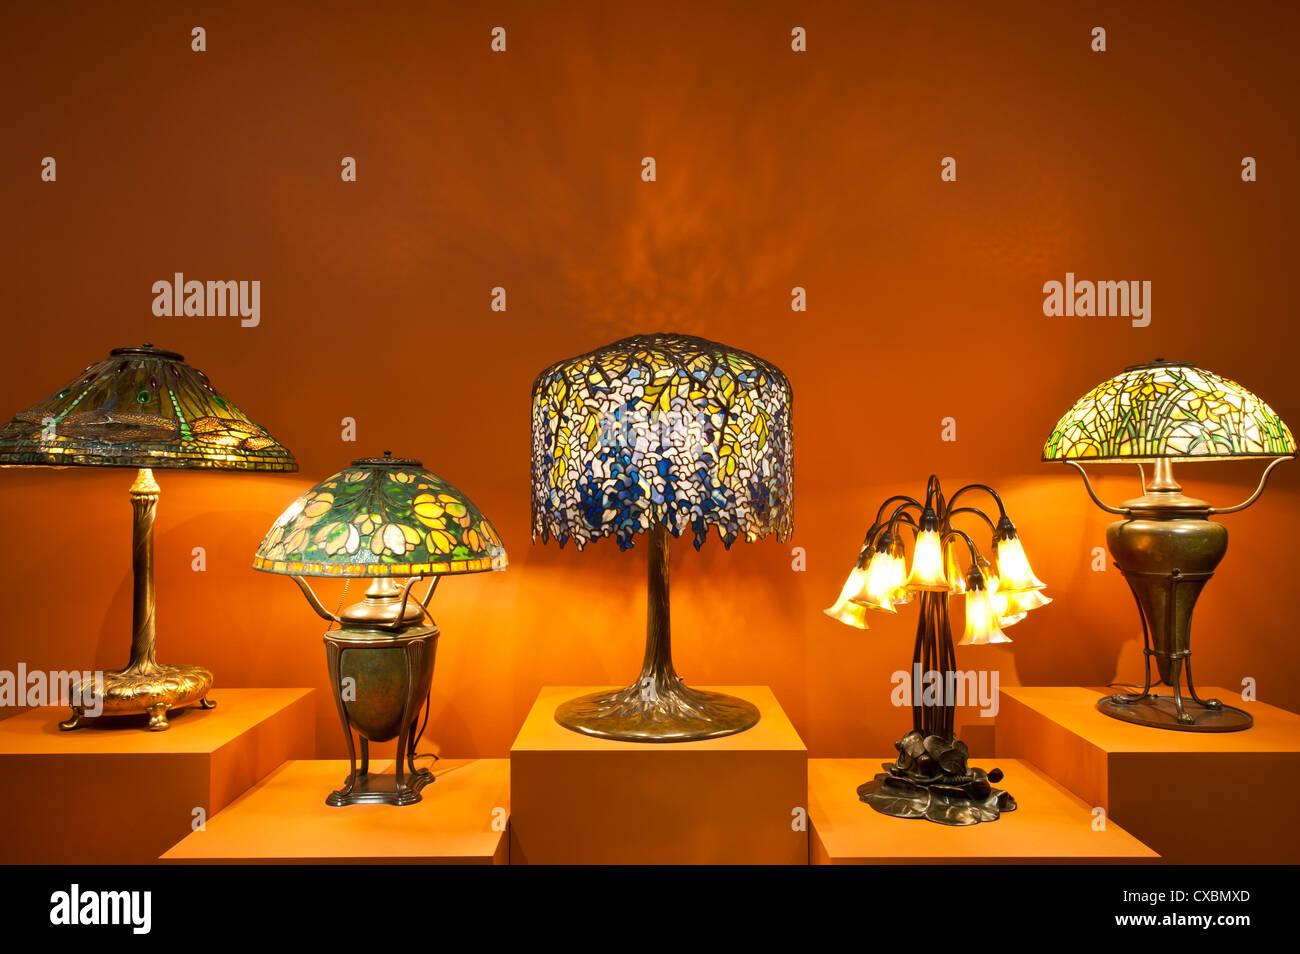 Tiffany Lampen Amsterdam : Tiffany lampe stockfotos & tiffany lampe bilder alamy